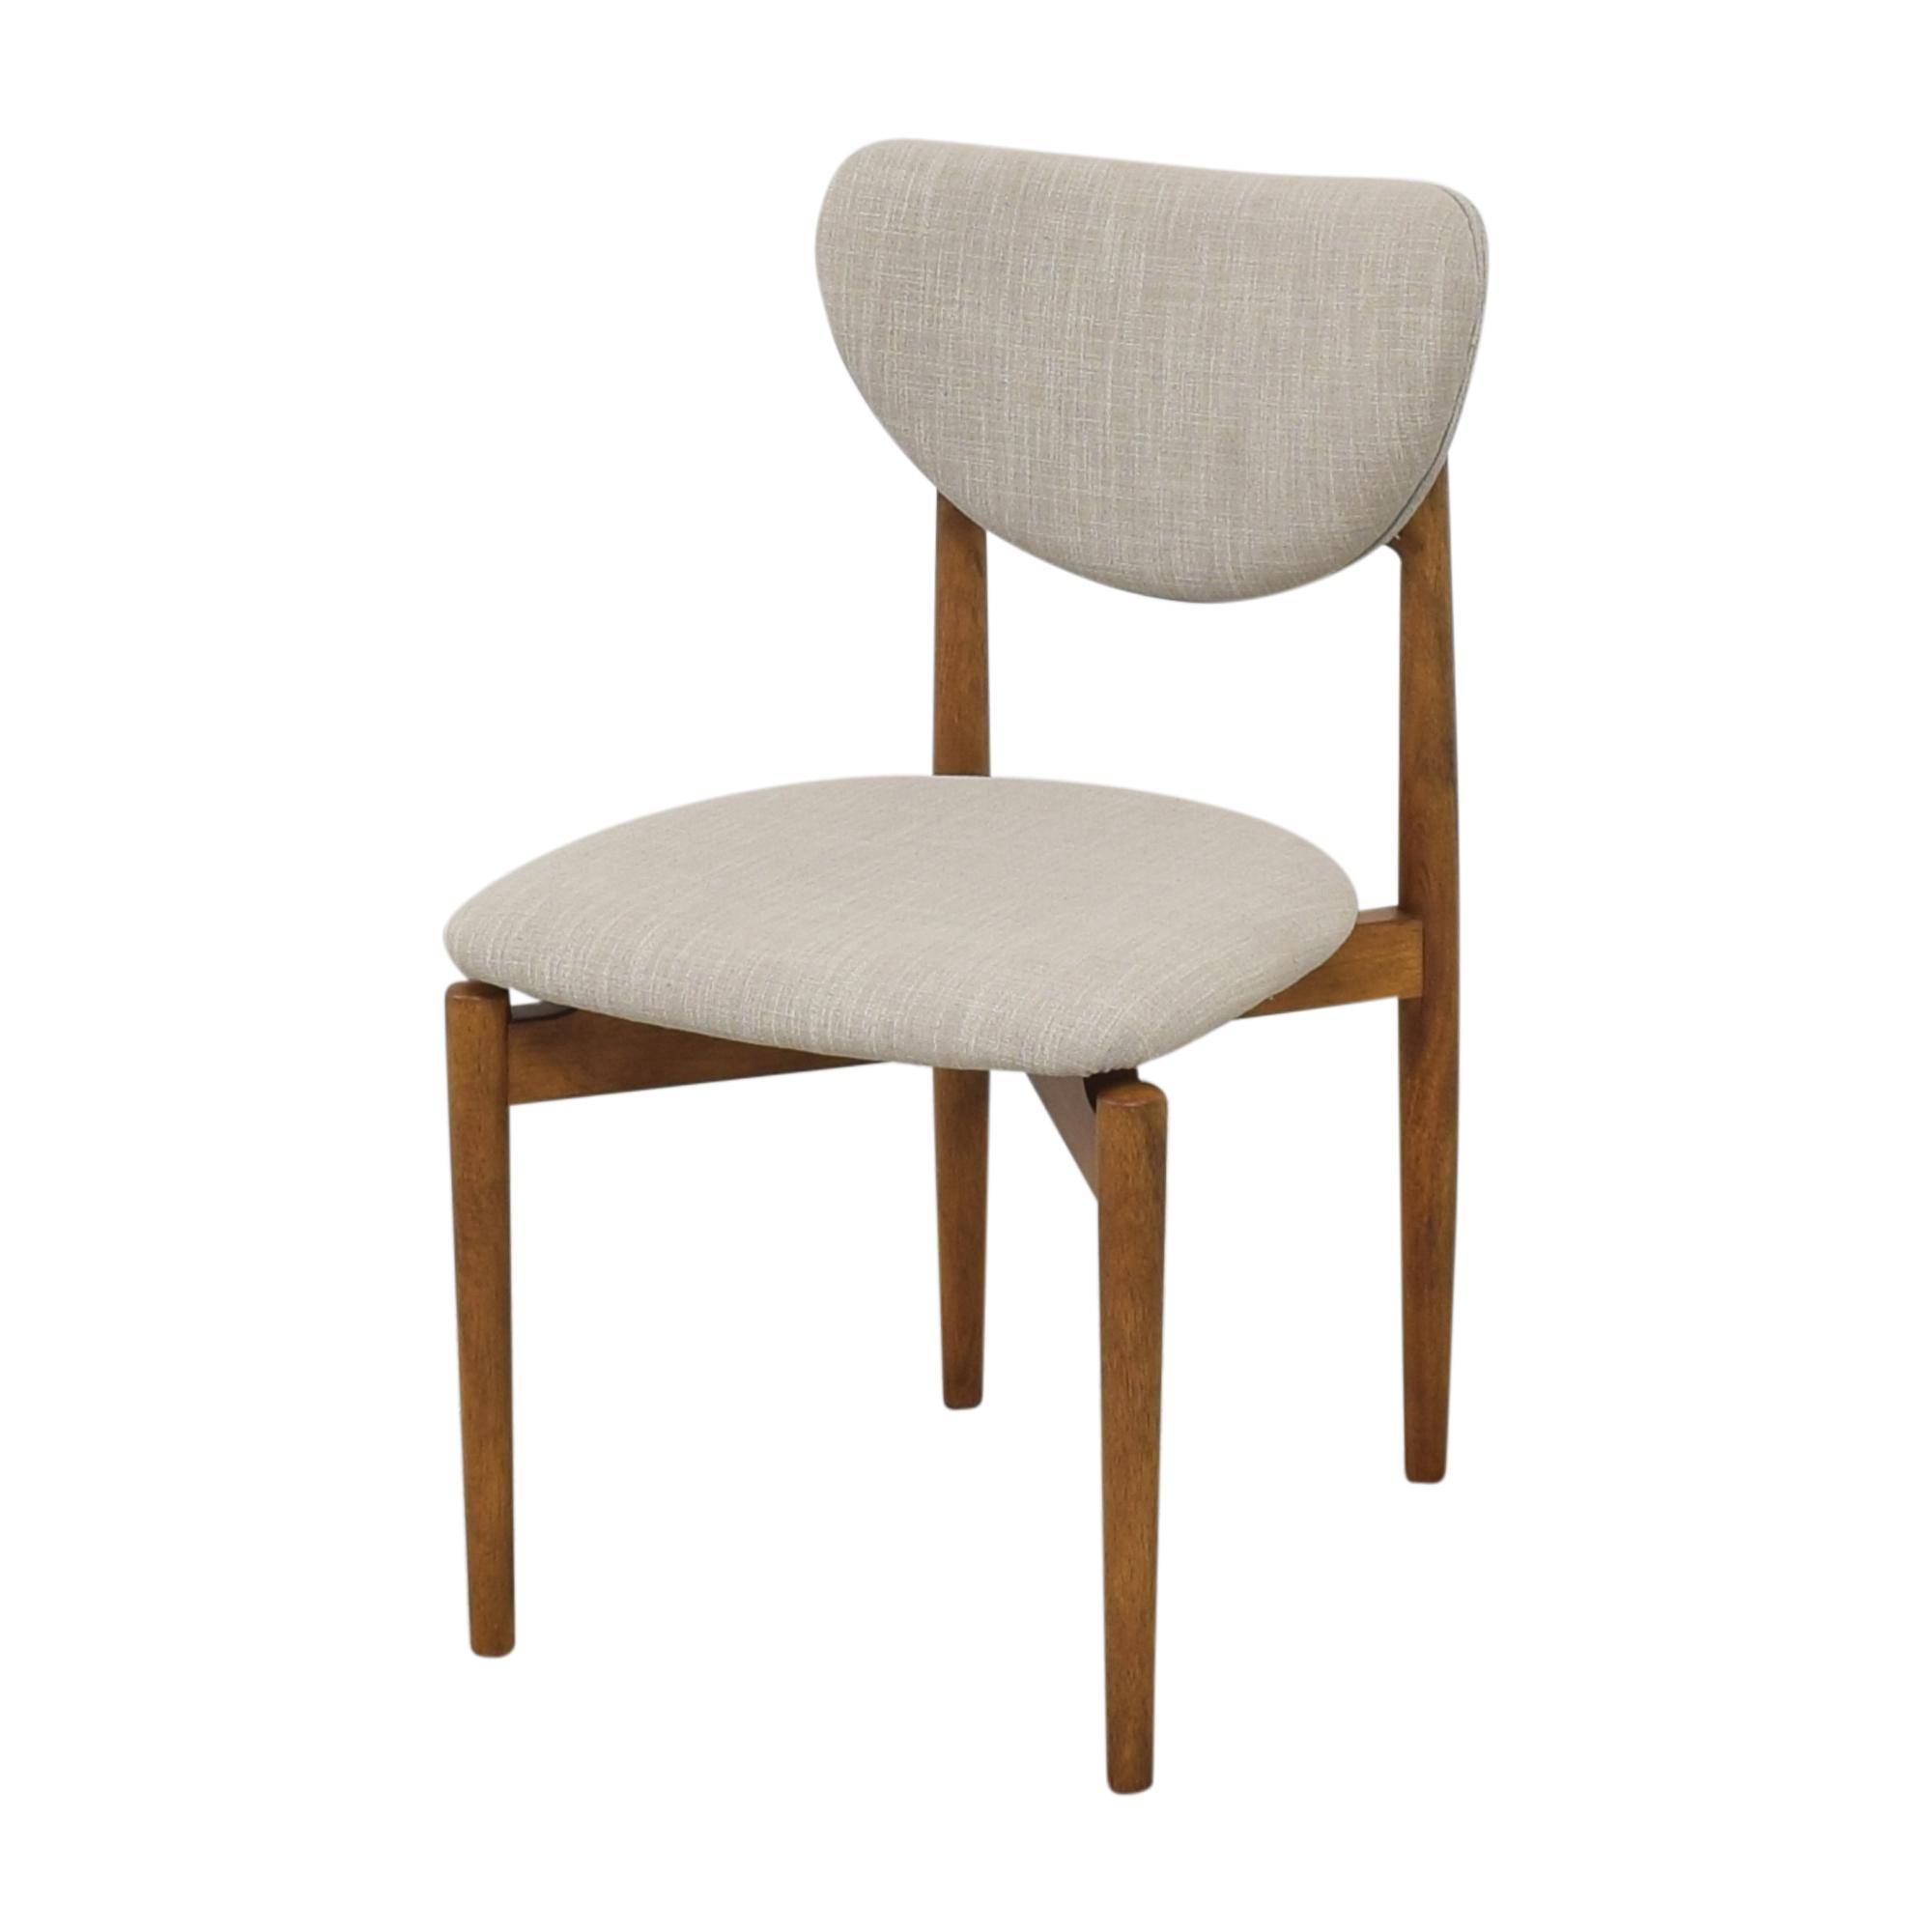 West Elm West Elm Dane Side Chair Chairs